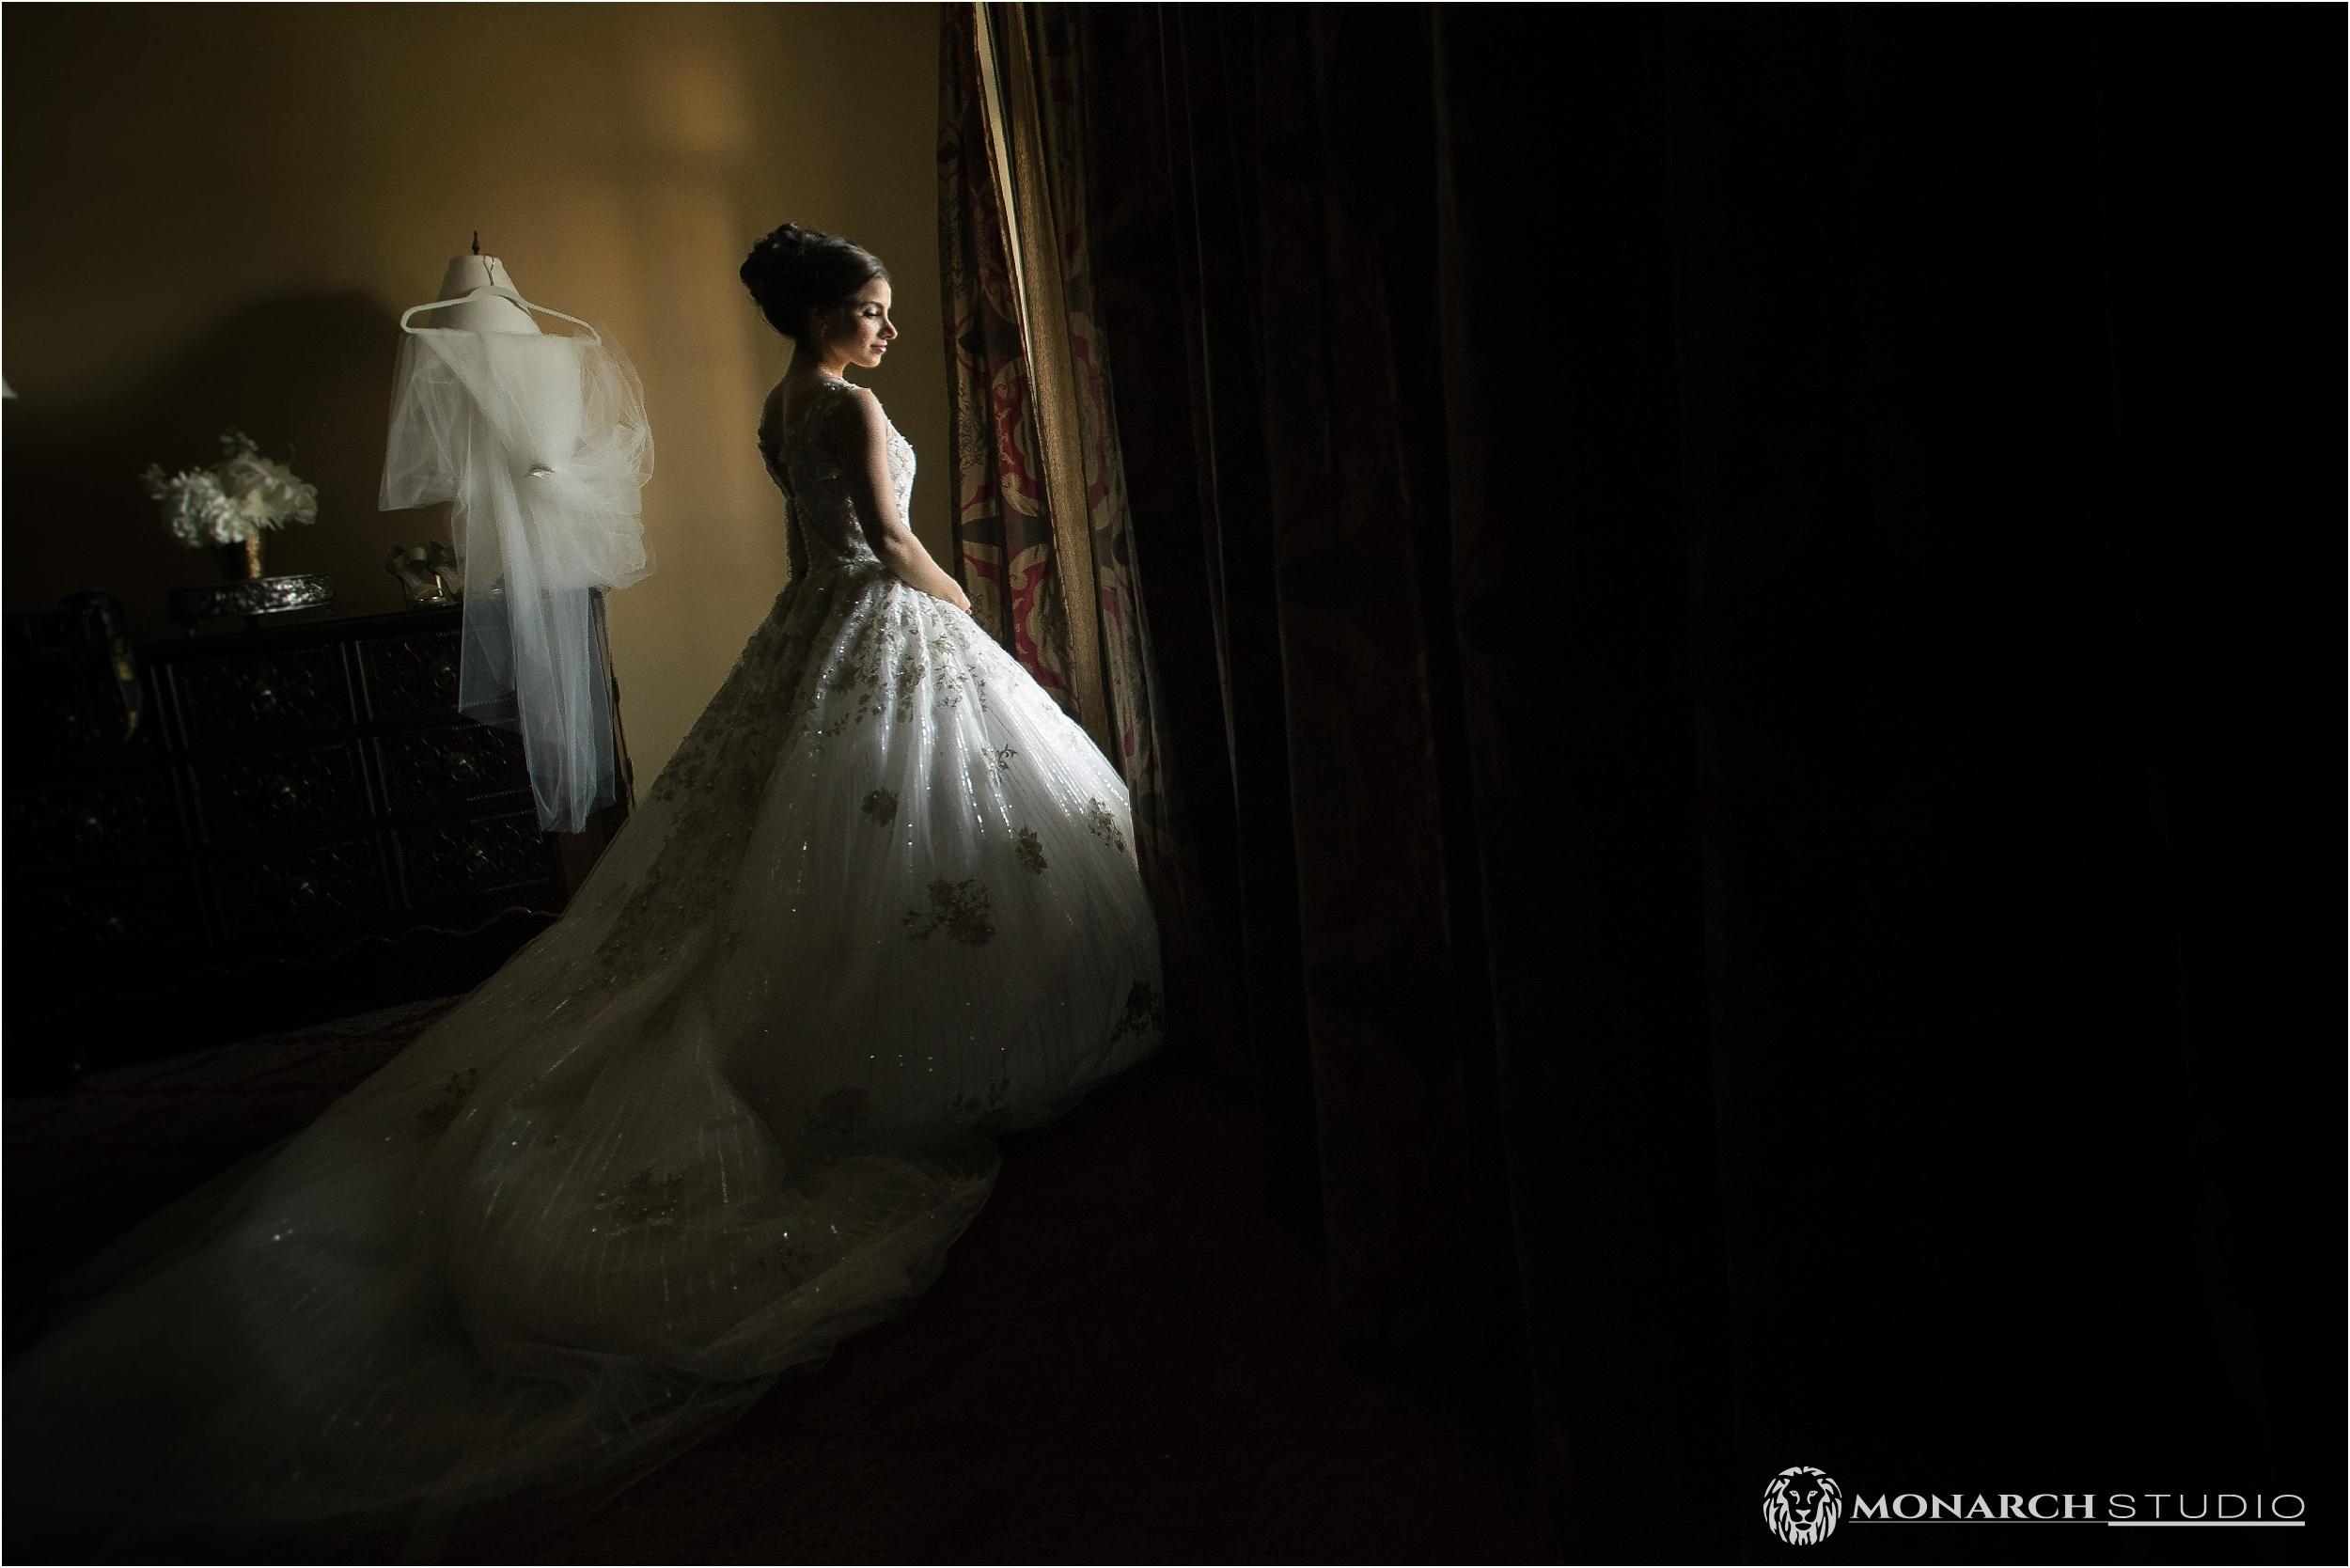 Persian-Aghd-Wedding-Photographer- سفره عقد-008.jpg